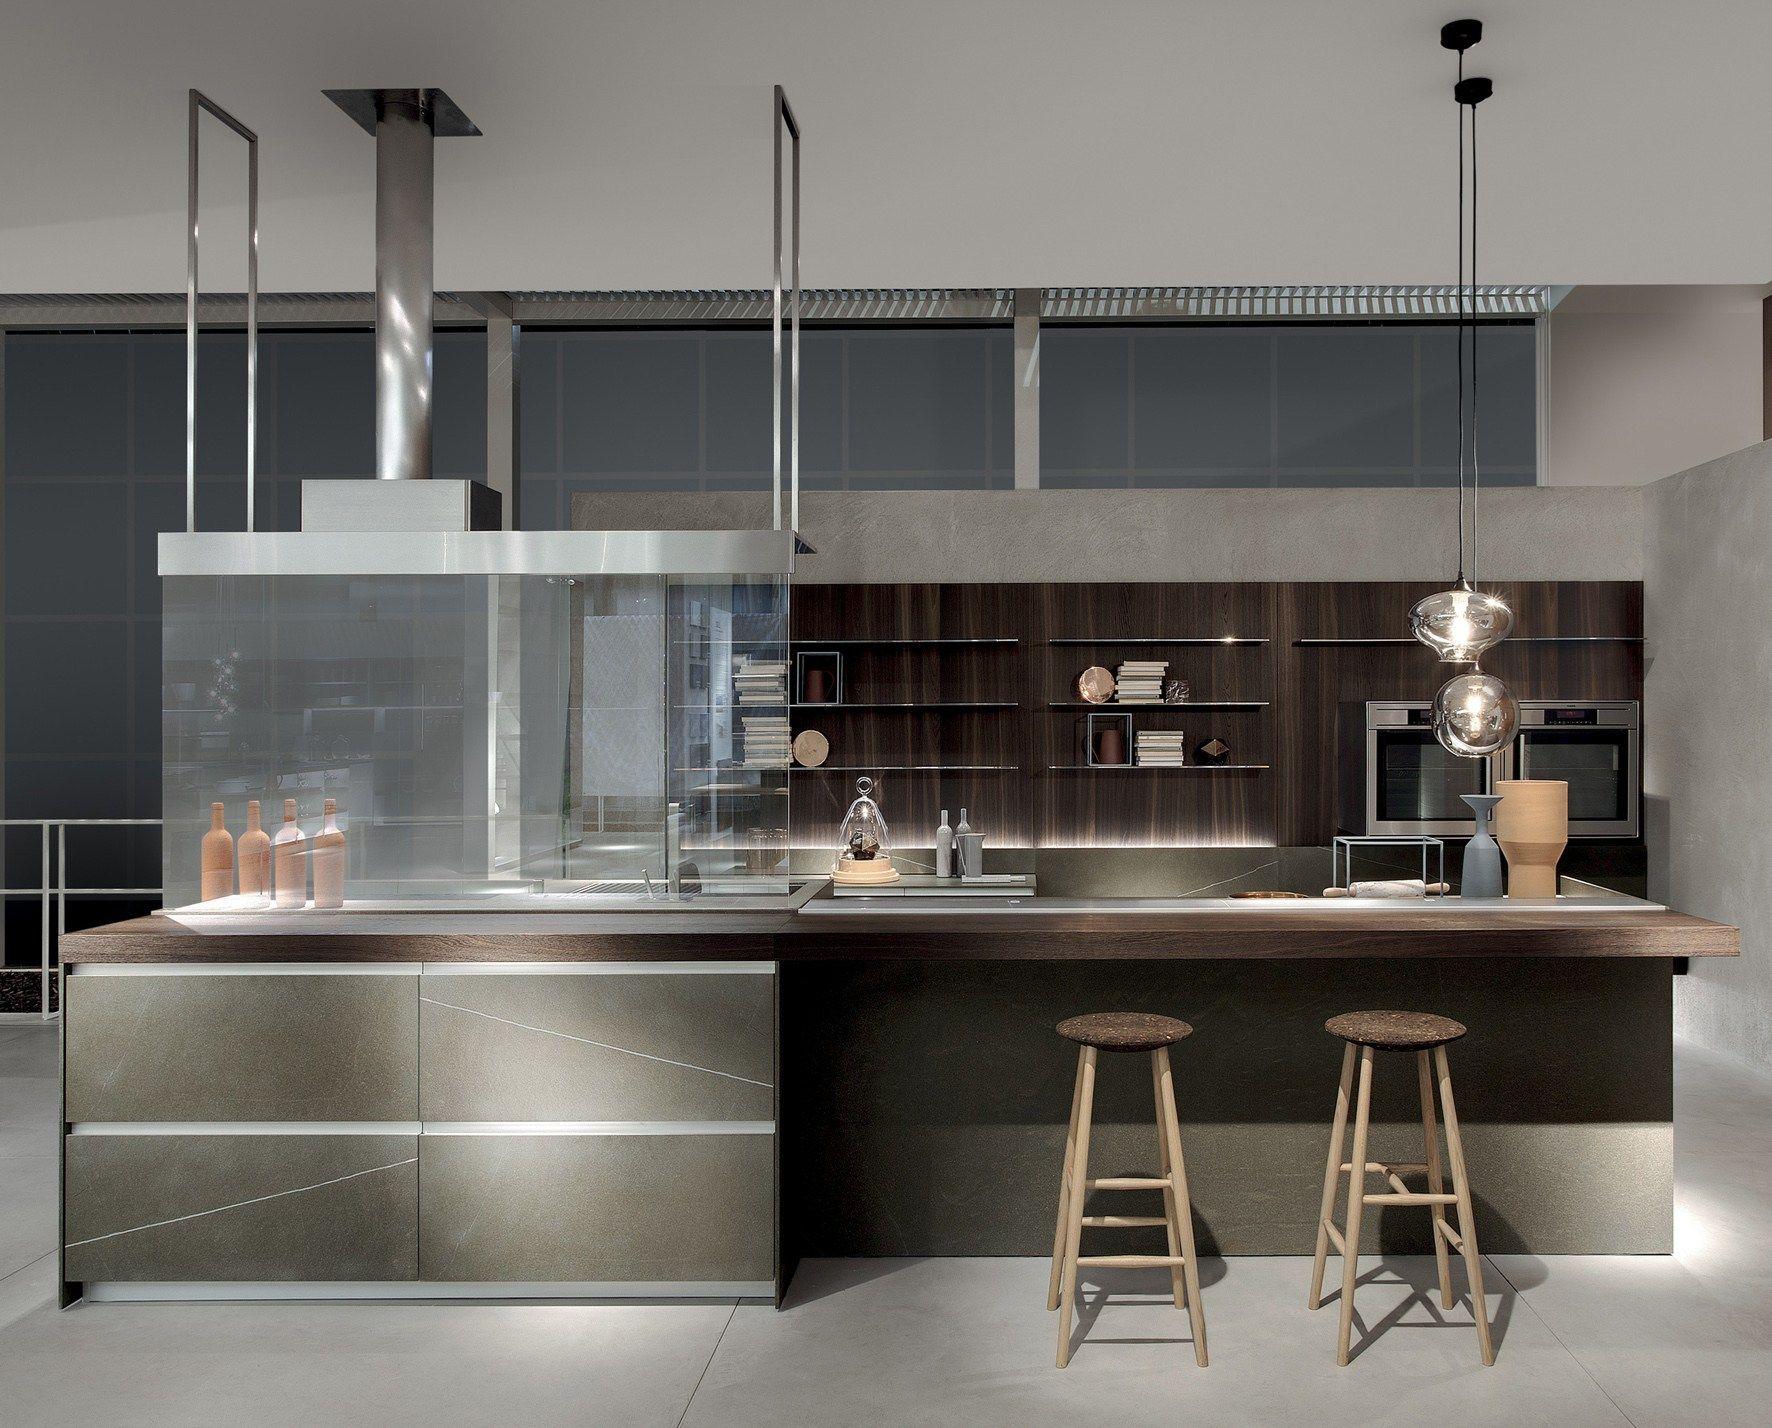 Cucina senza maniglie icon by ernestomeda design giuseppe - Cucina senza maniglie ...